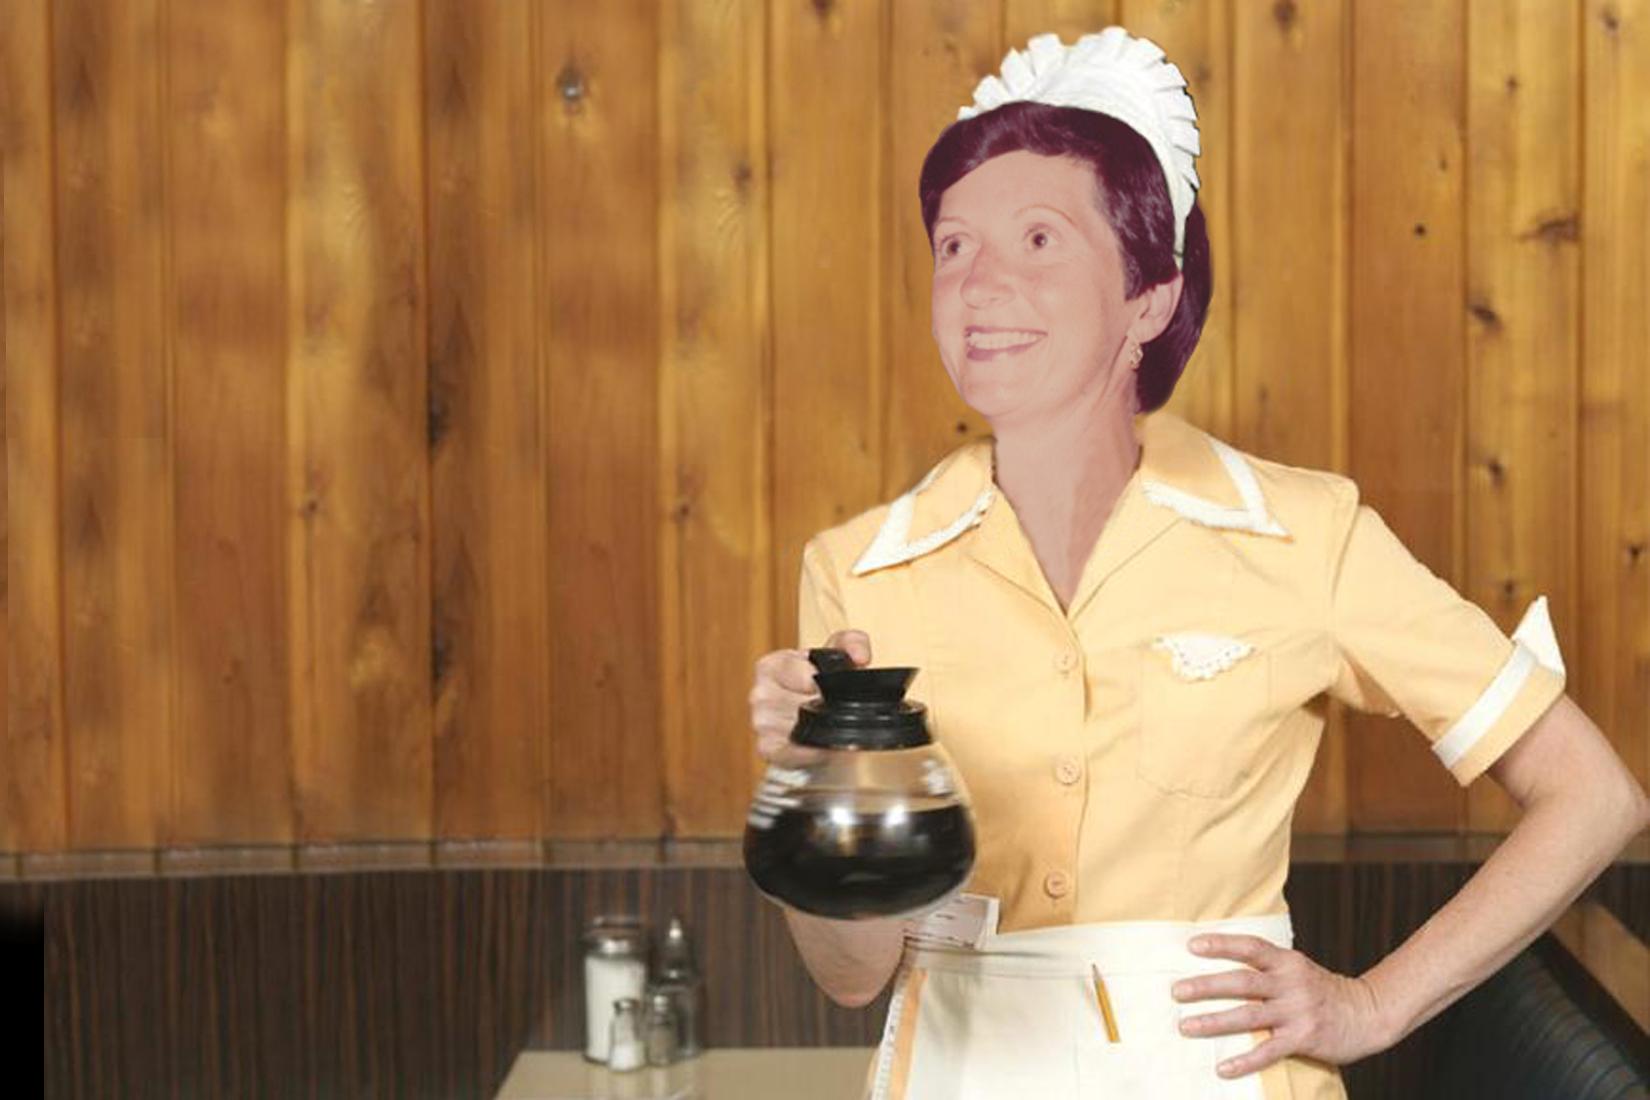 Waitress with coffee.